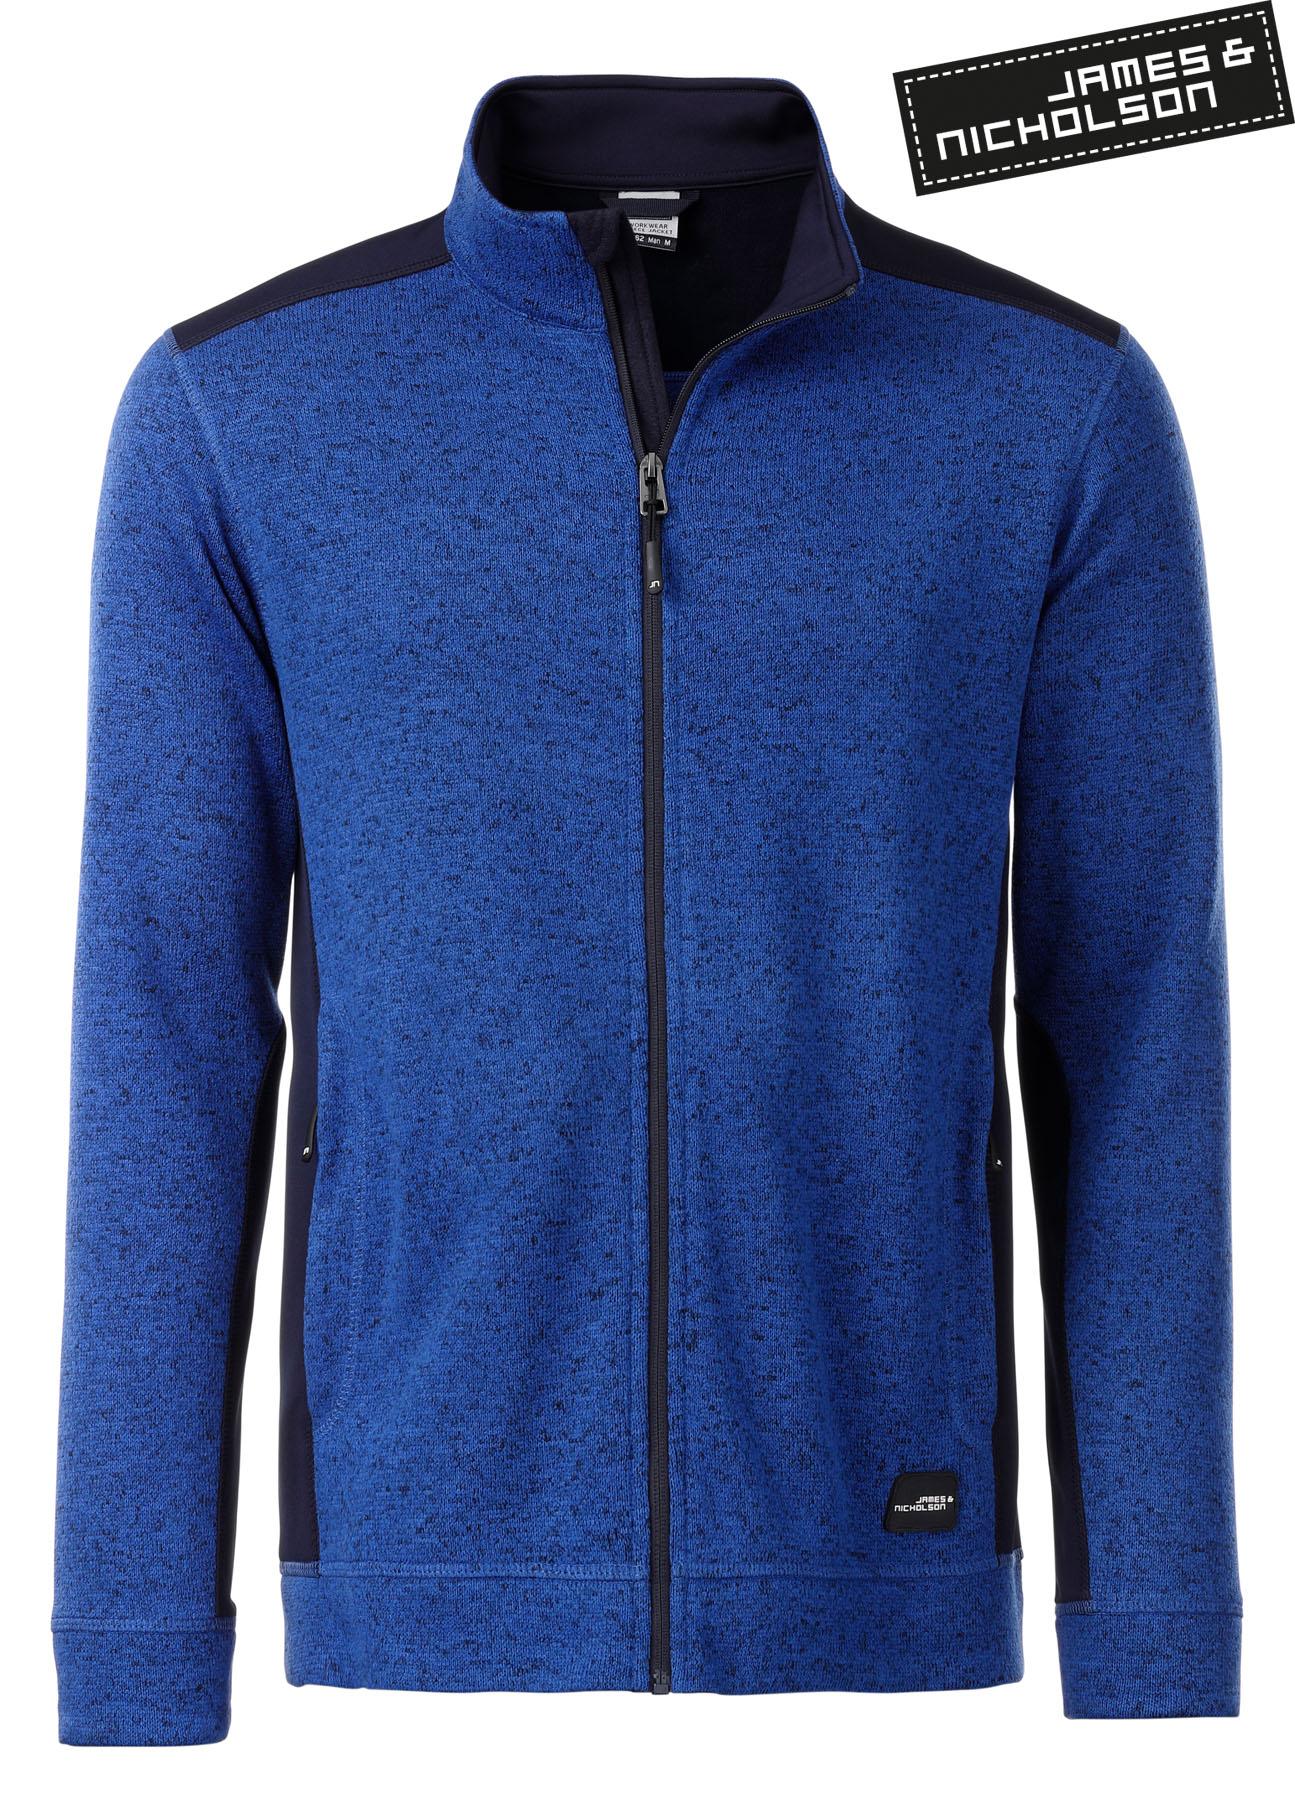 James & Nicholson, Workwear Fleecejacke, besticken « Merkur